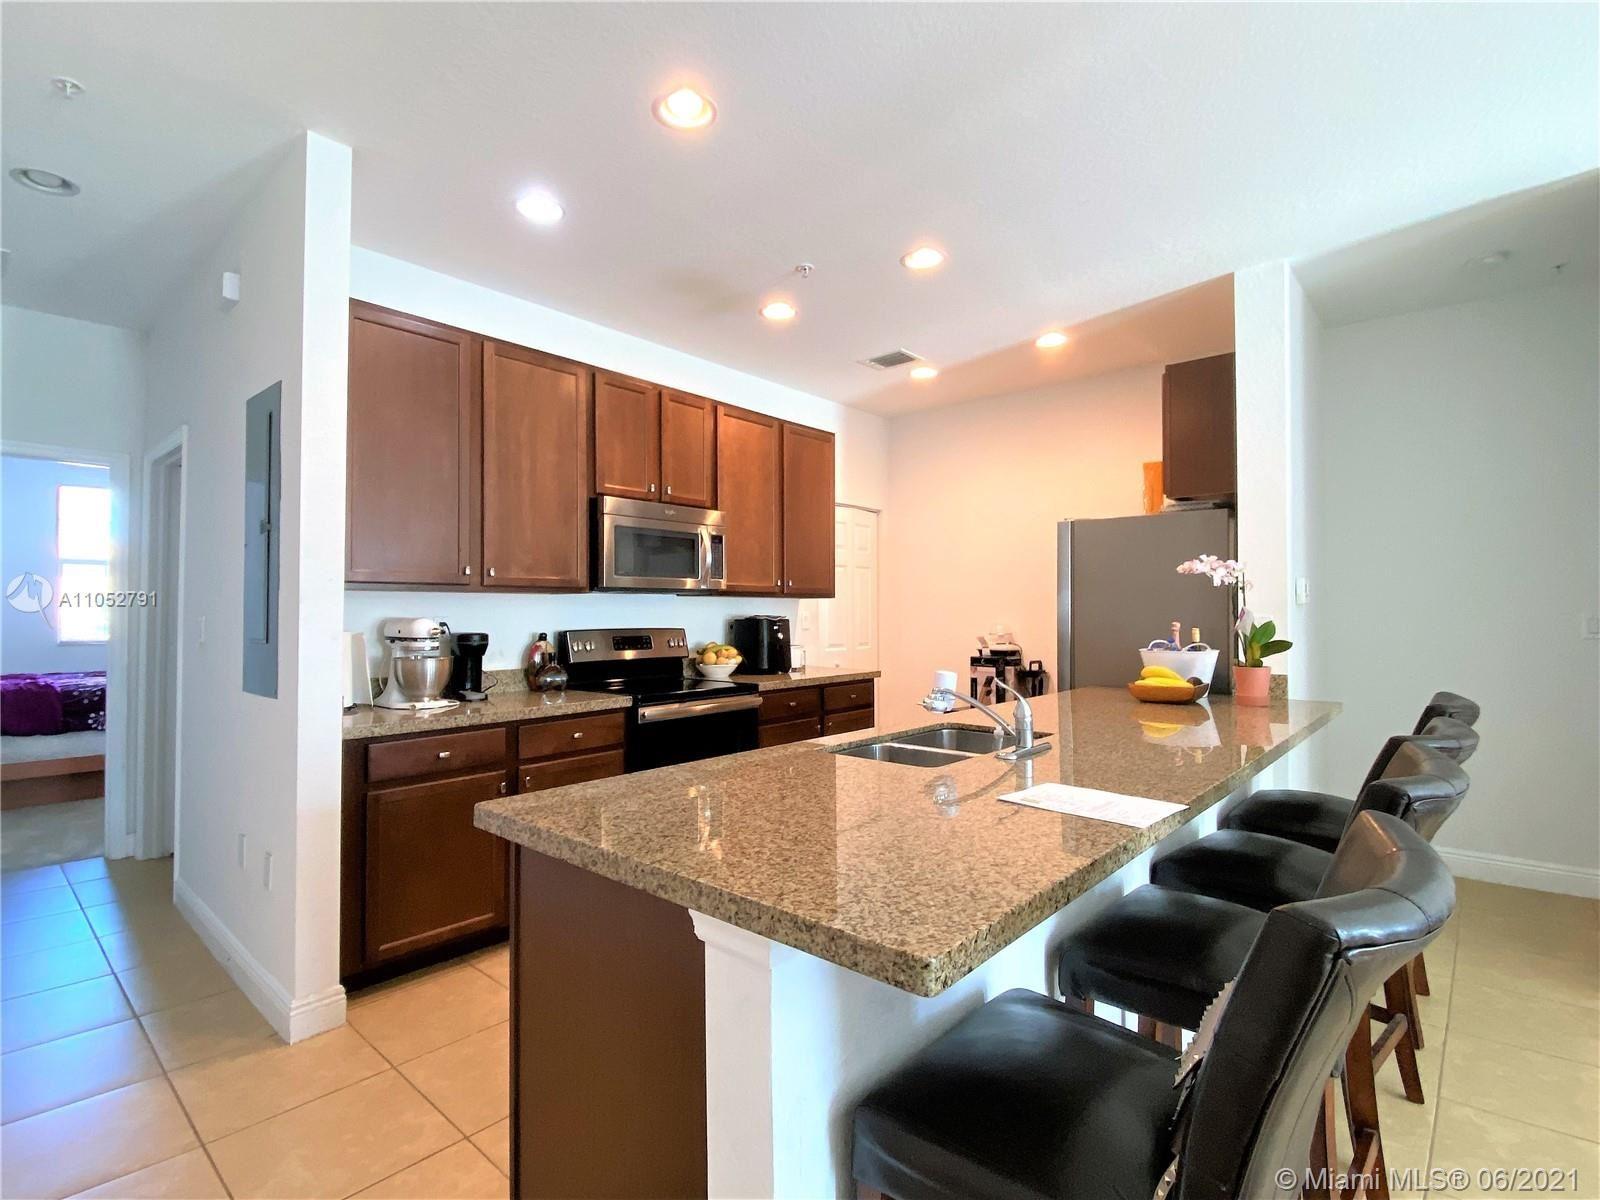 957 SW 147th Ave #957, Pembroke Pines, FL 33027 - #: A11052791